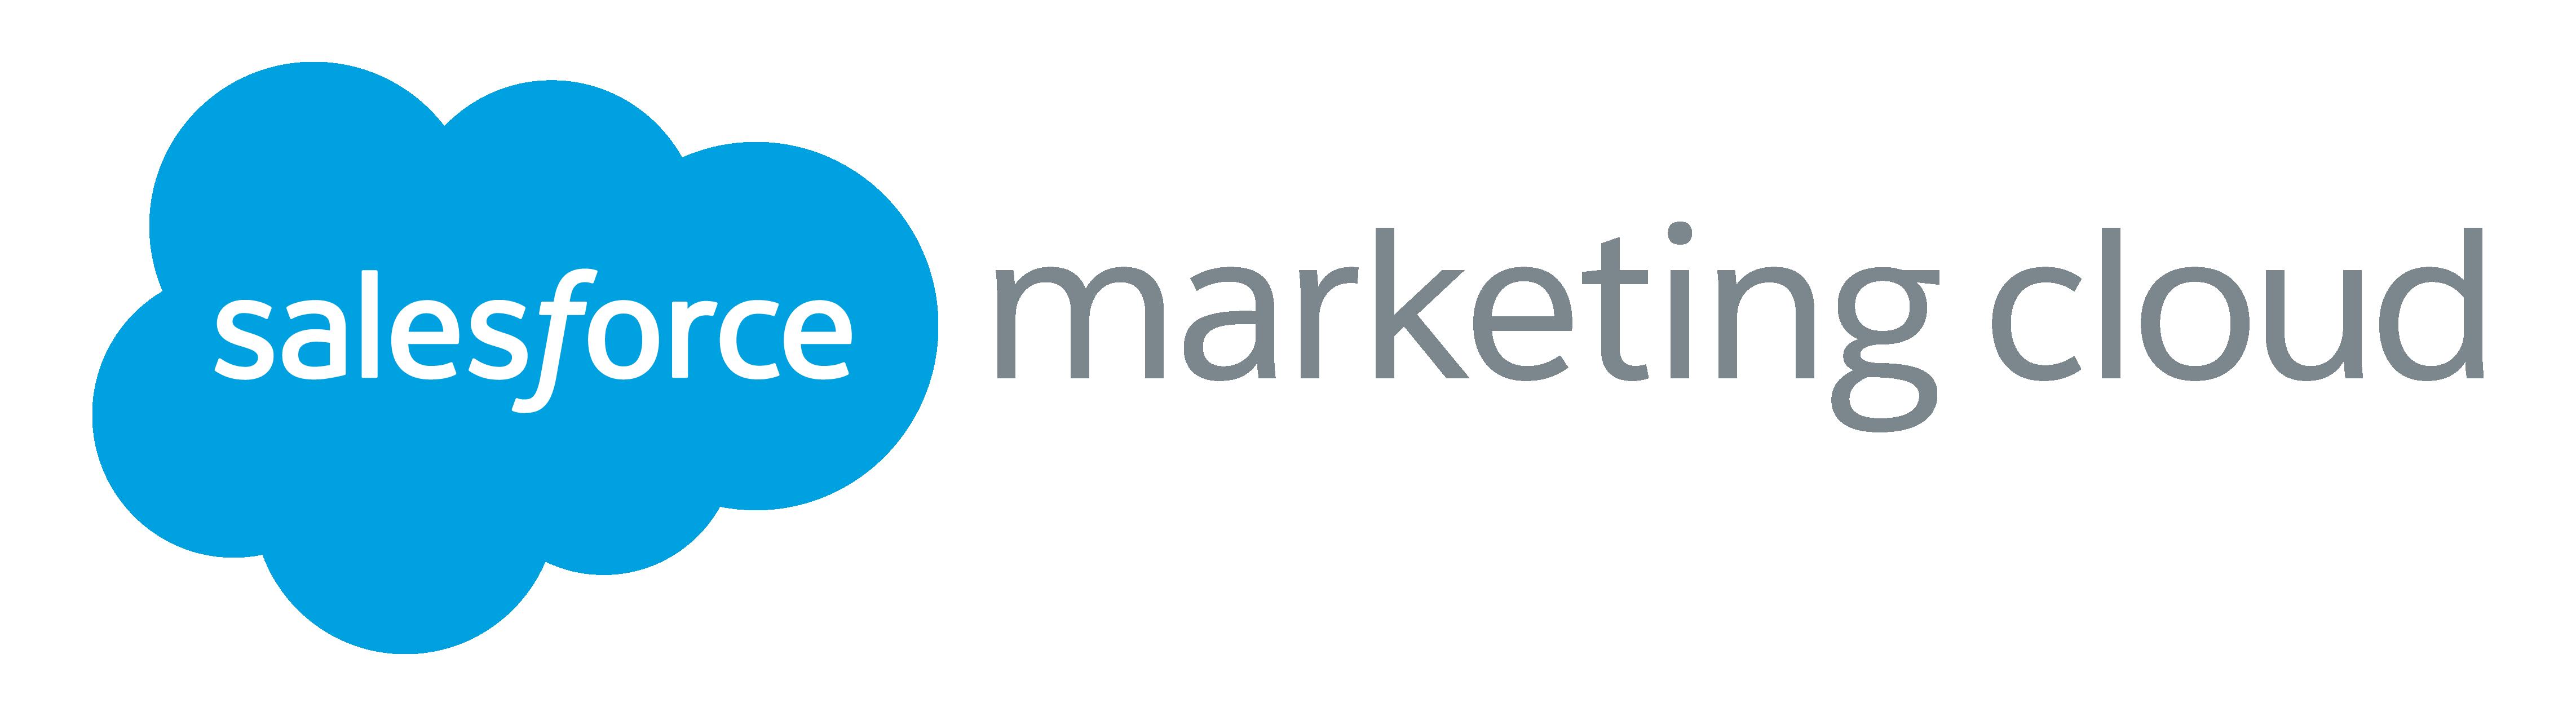 Salesforce_Marketing_Cloud.png